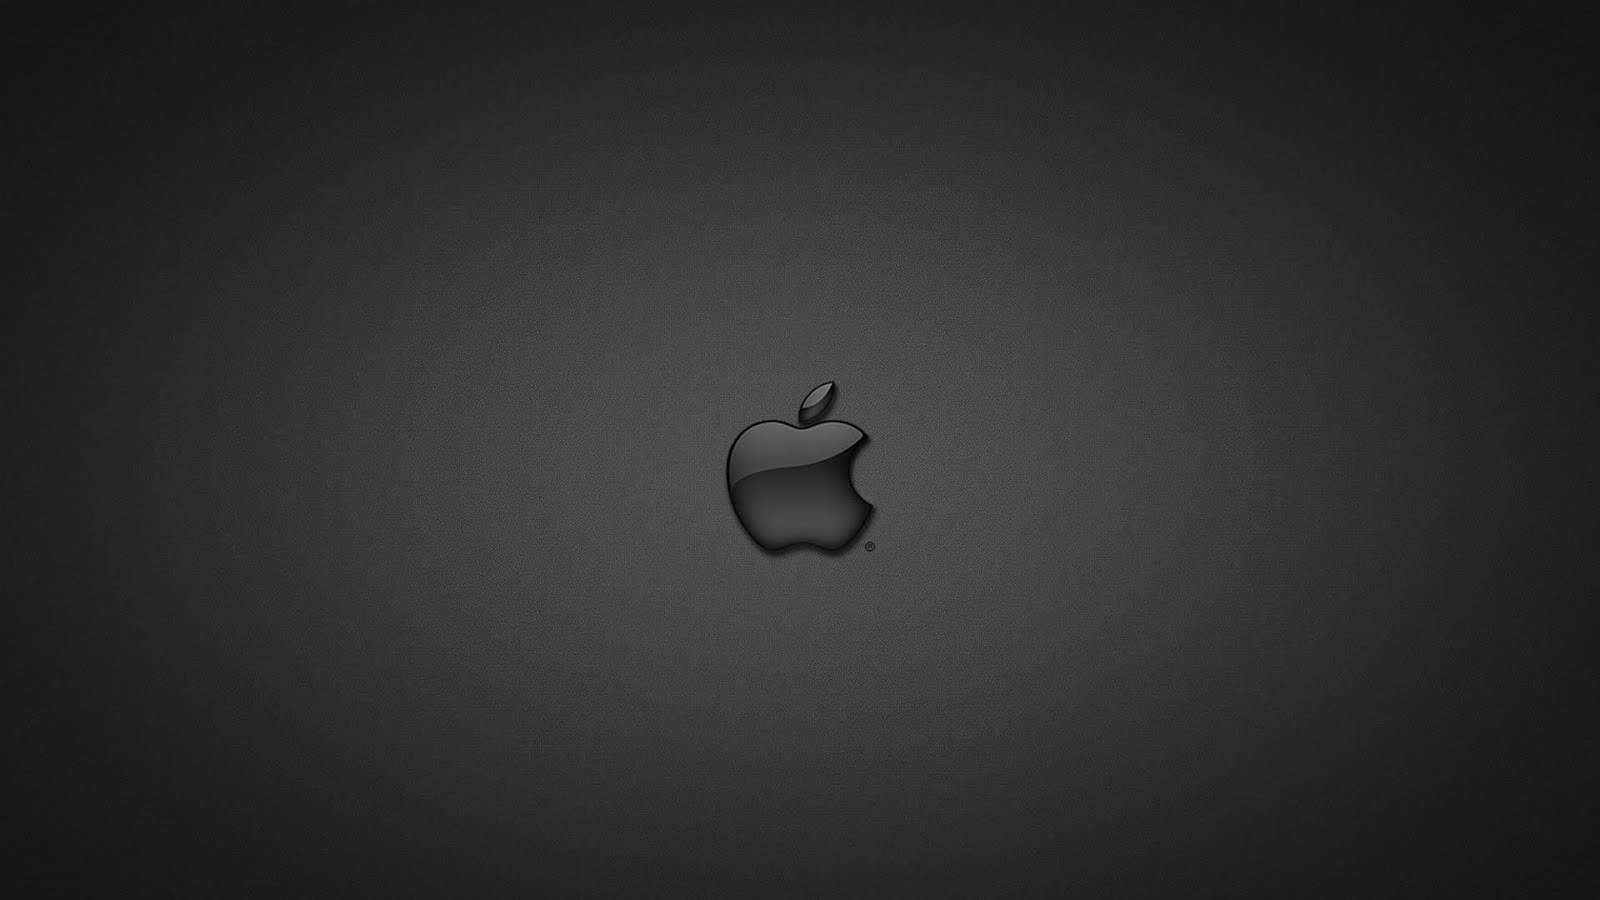 Apple Wallpaper Hd 1080p Black